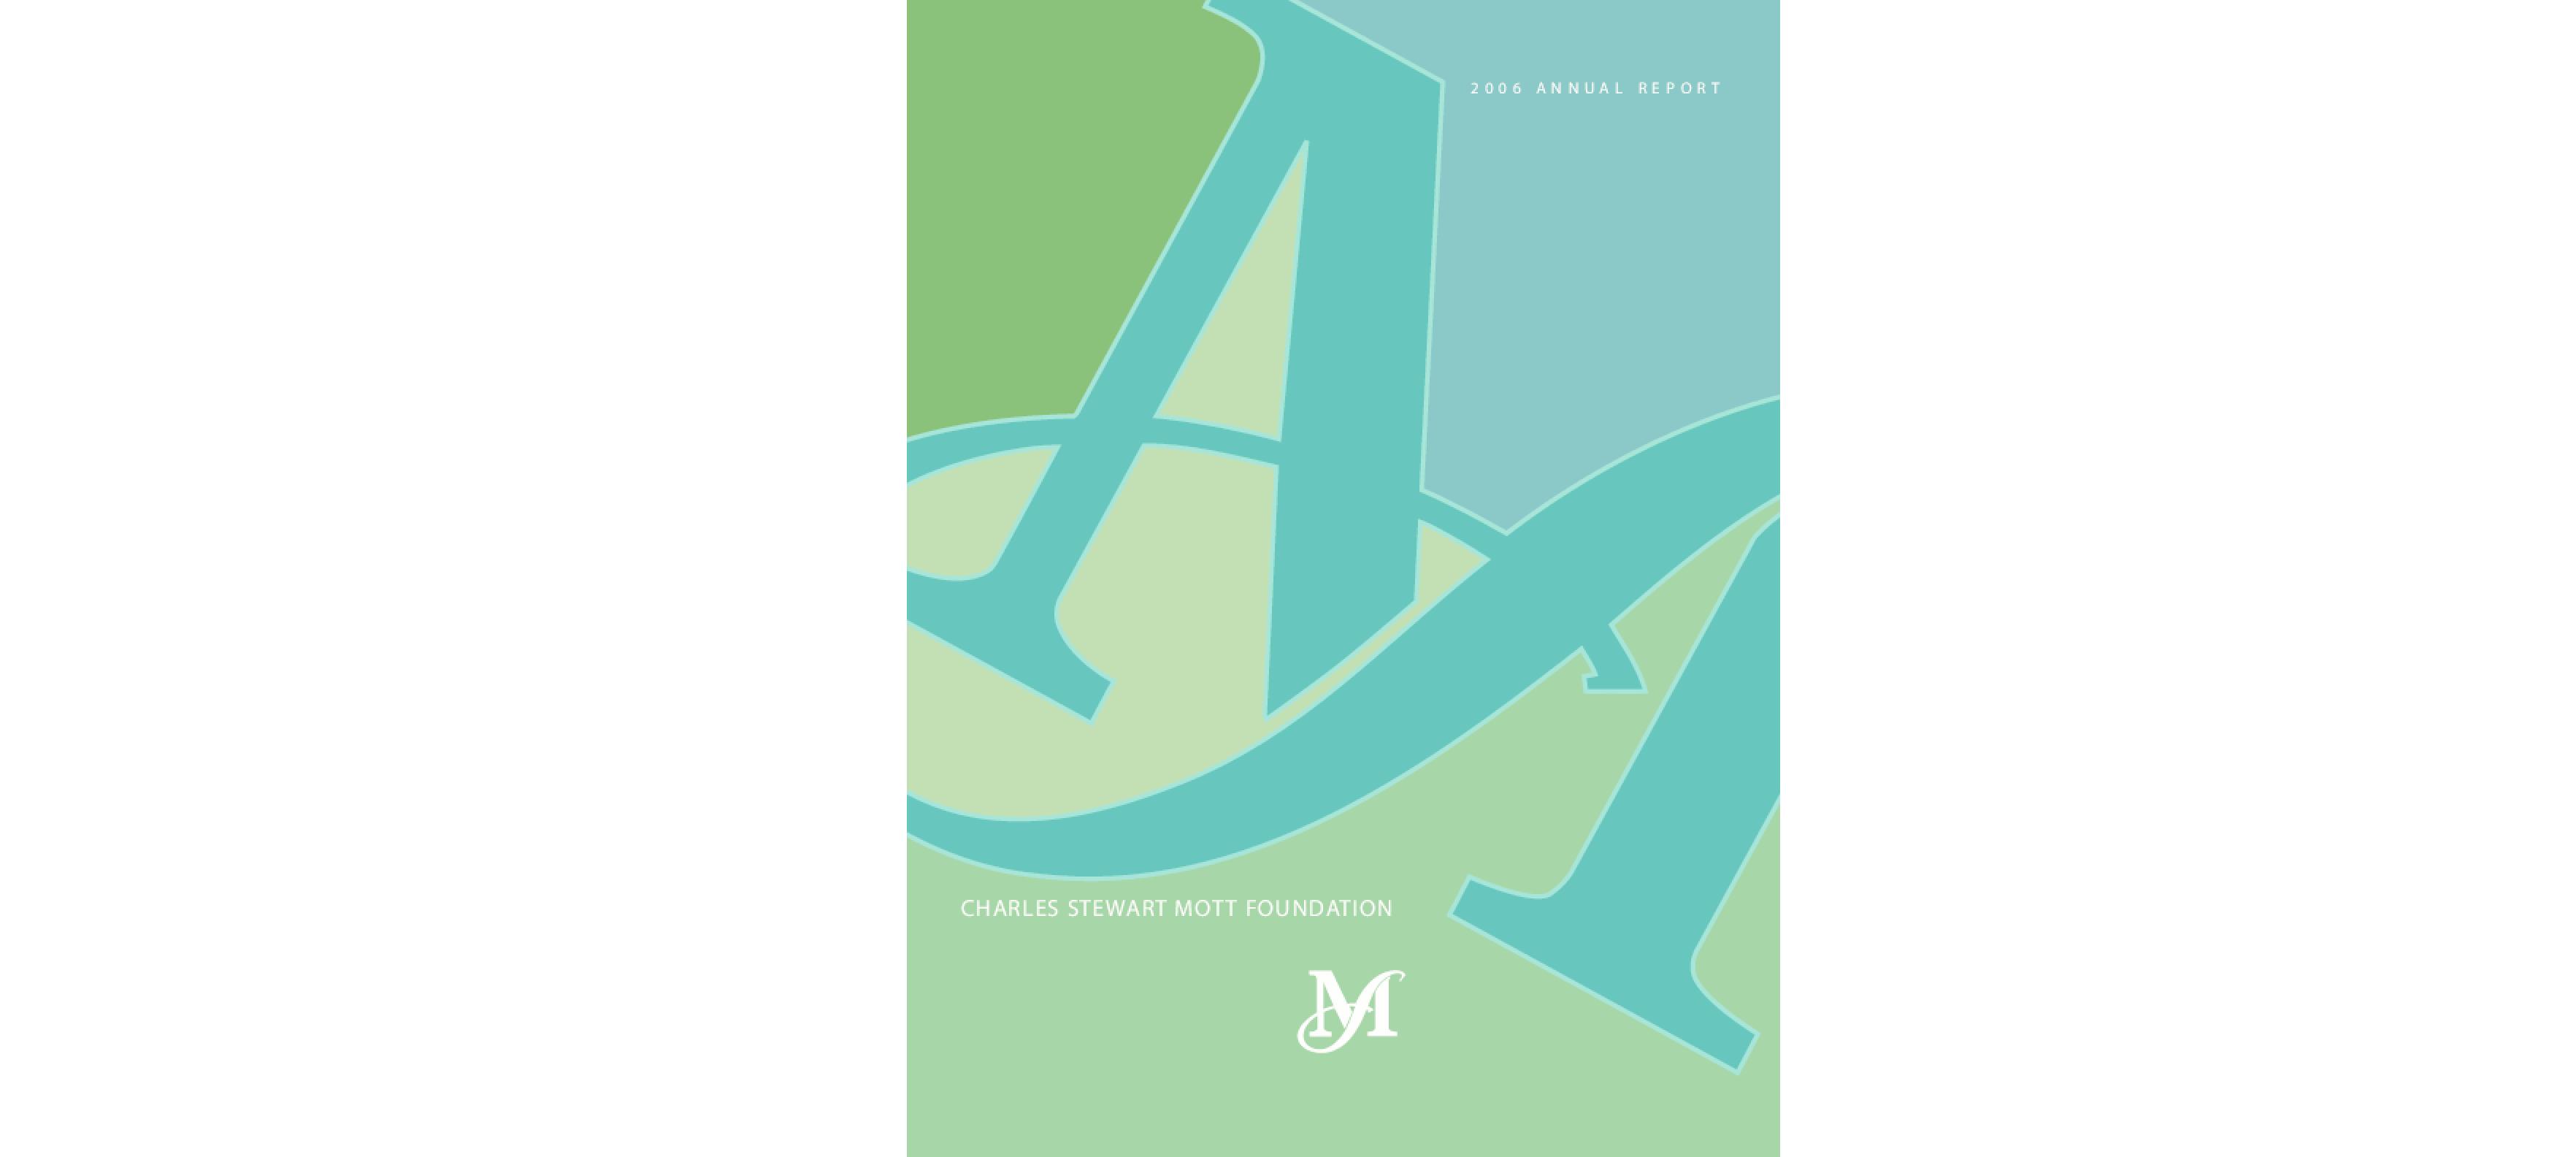 Charles Stewart Mott Foundation - 2006 Annual Report